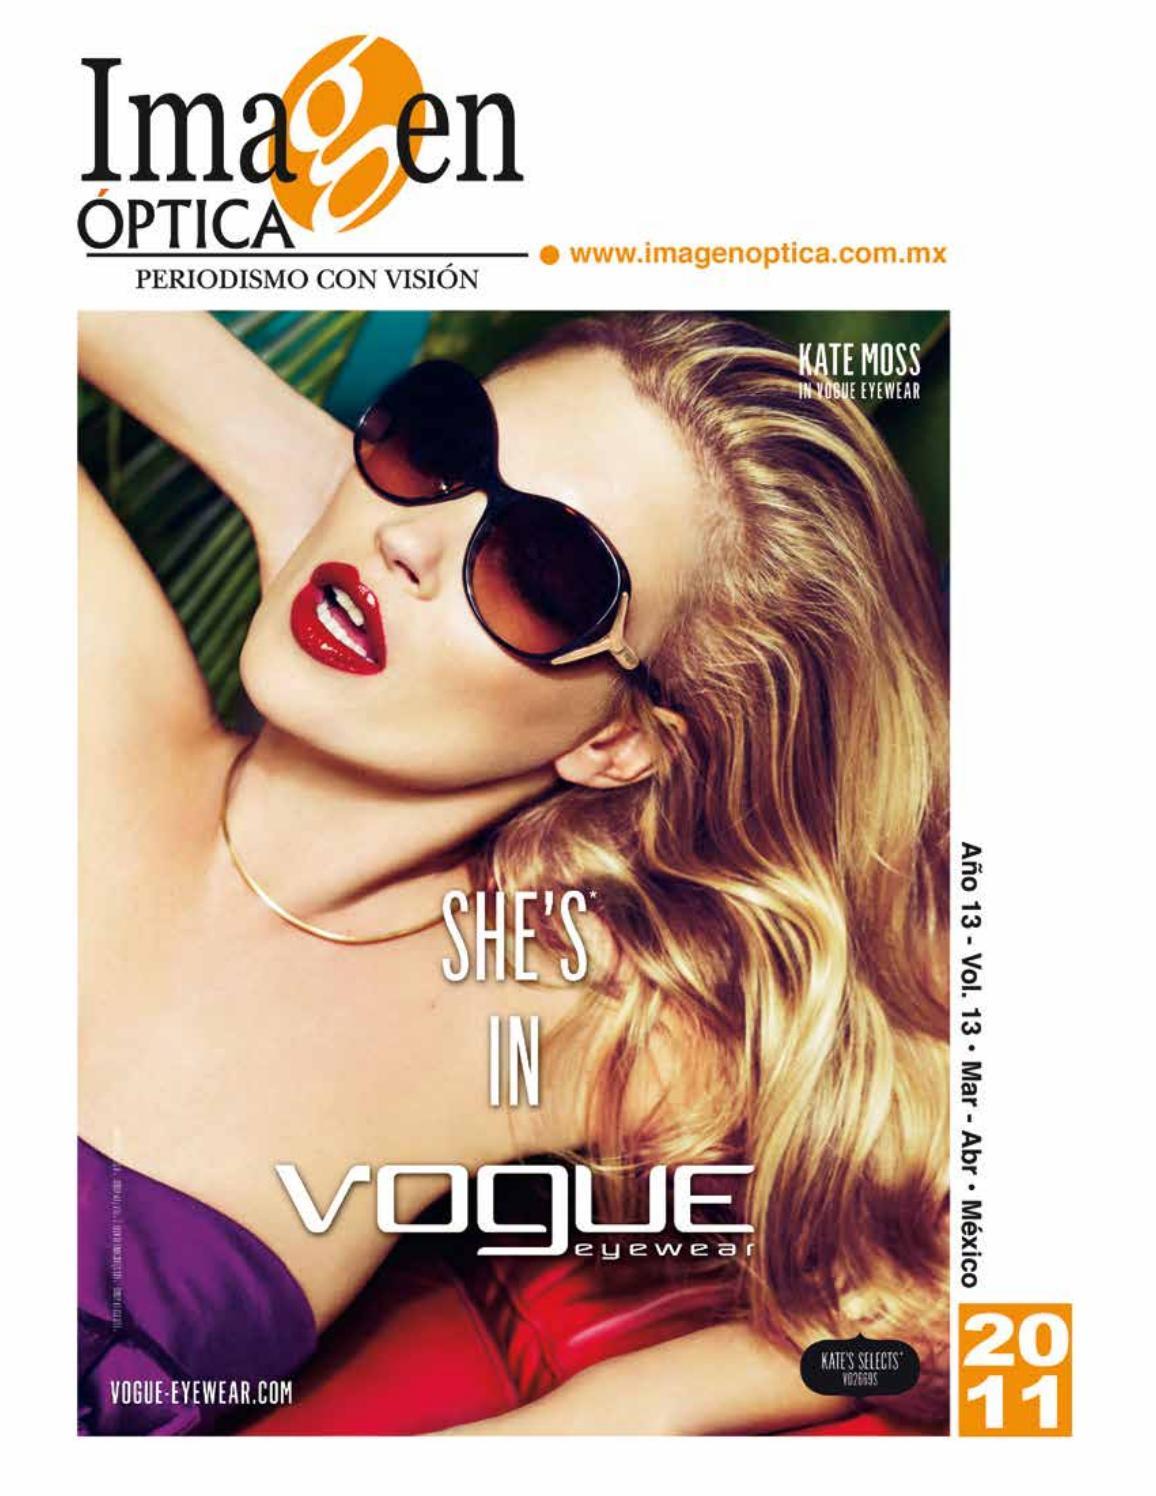 Revista Marzo Abril 2011 by Imagen Optica - issuu